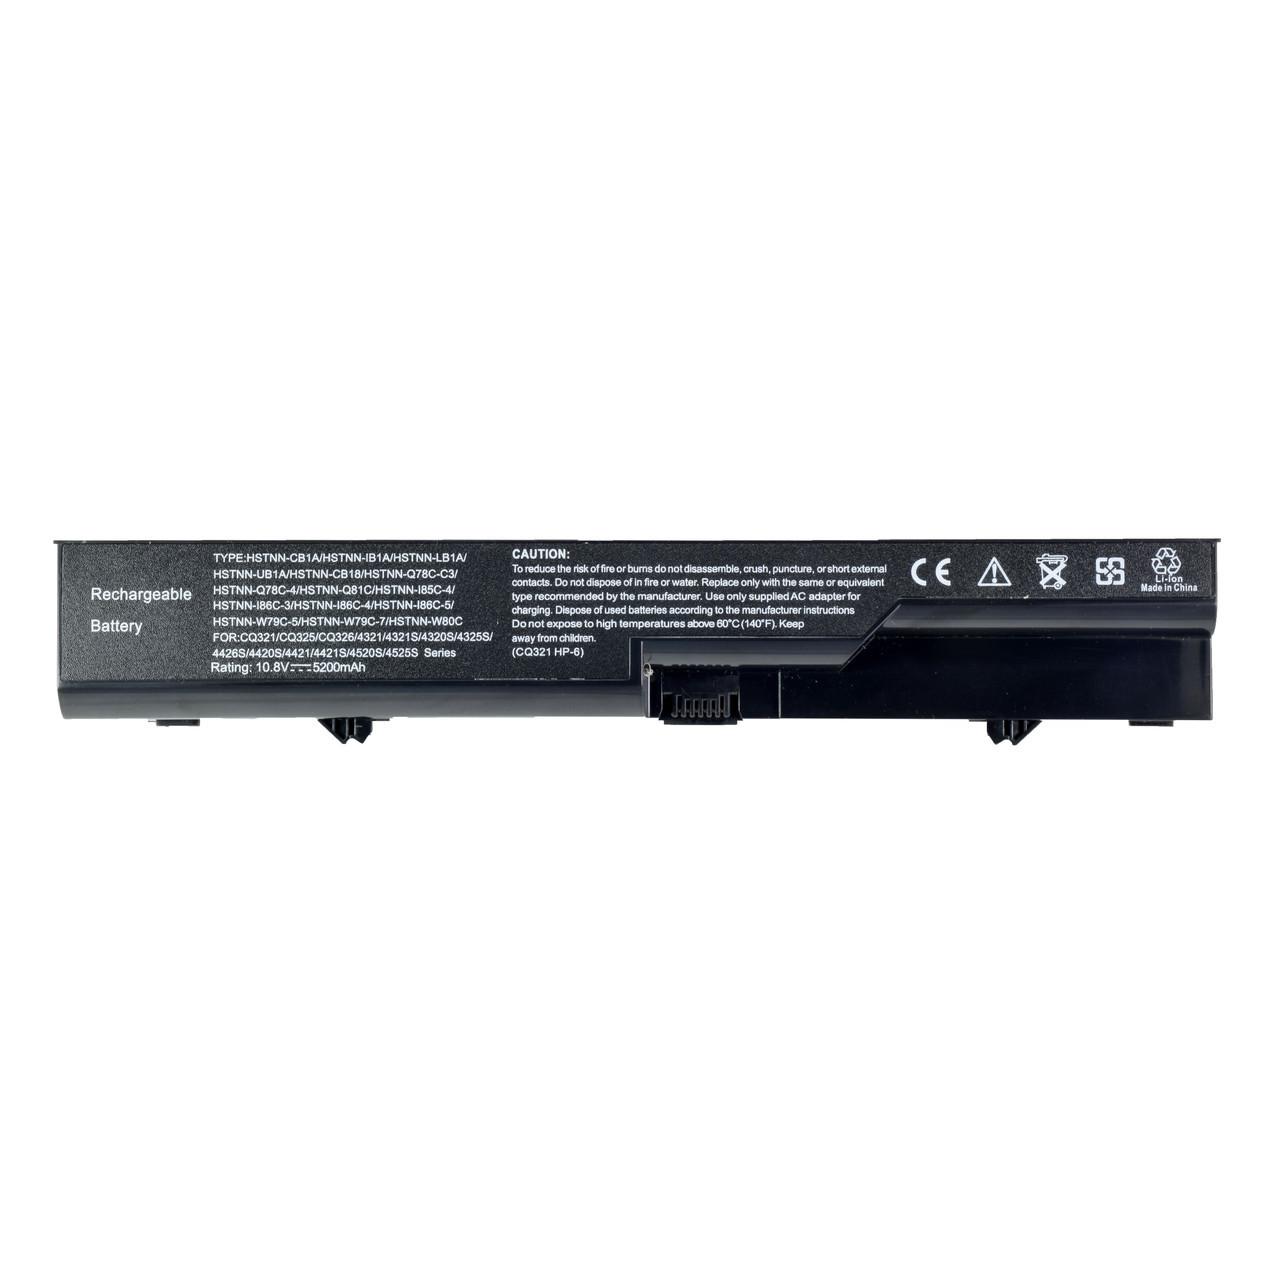 Батарея для ноутбука HSTNN-W79C-5 PH06 587706-121 587706-131 587706-221 587706-241 587706-251